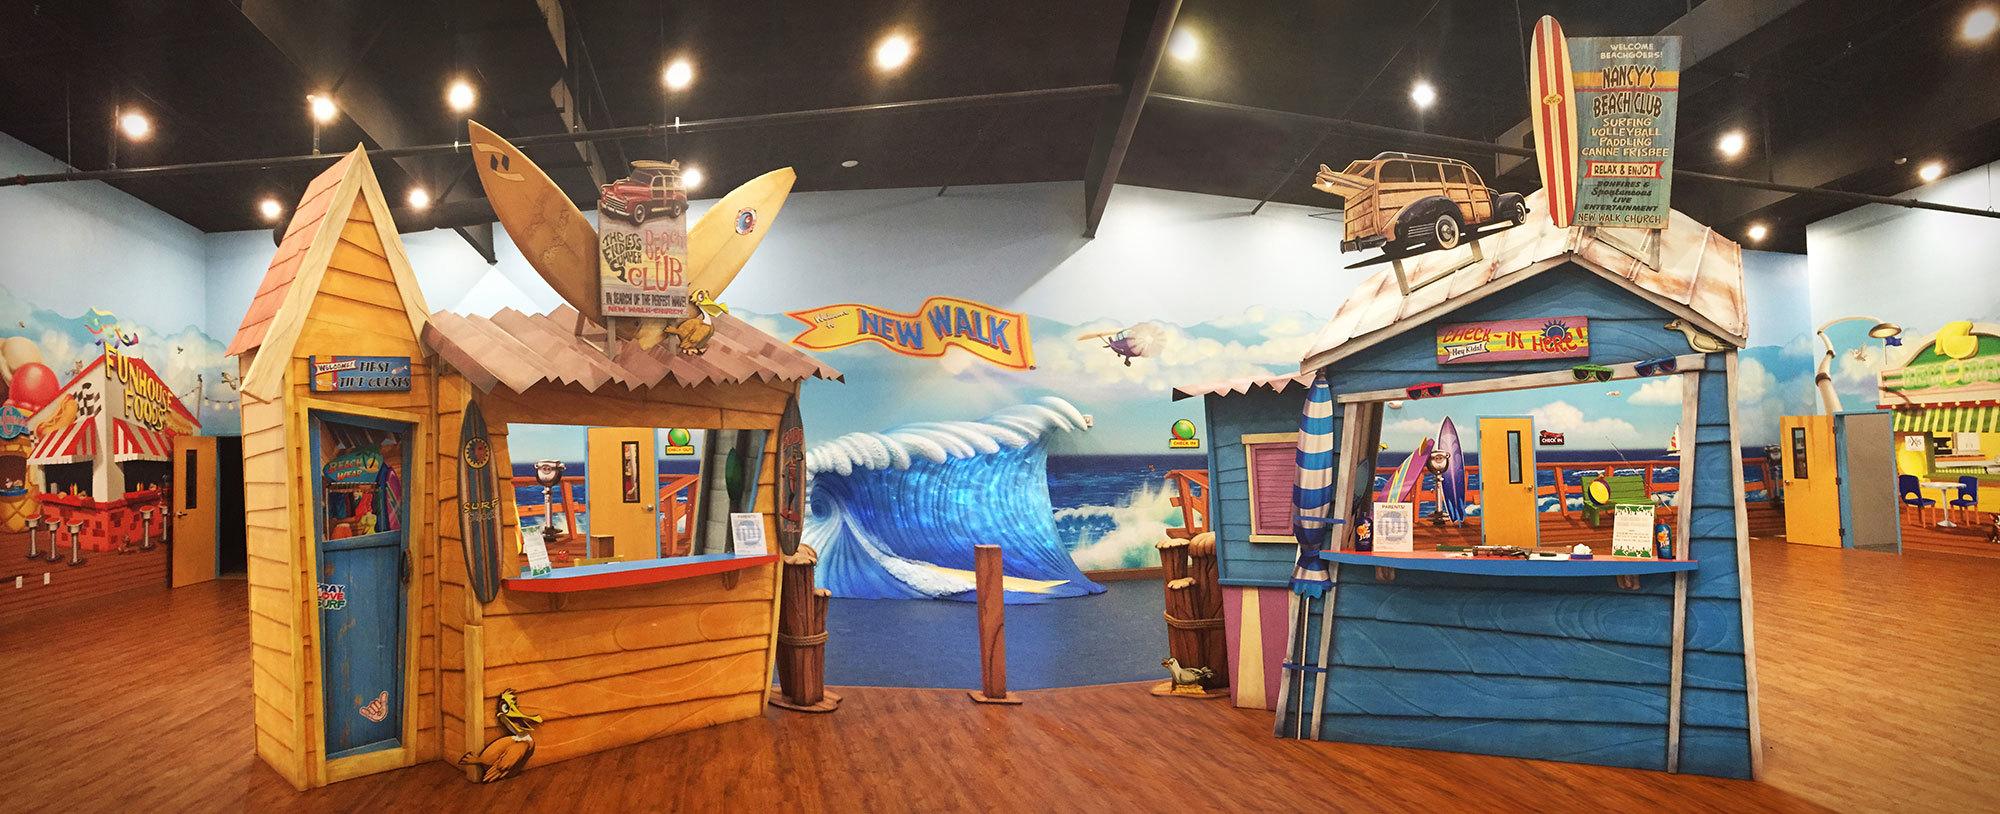 Beach & Boardwalk Themed Space at New Walk Church in Florida